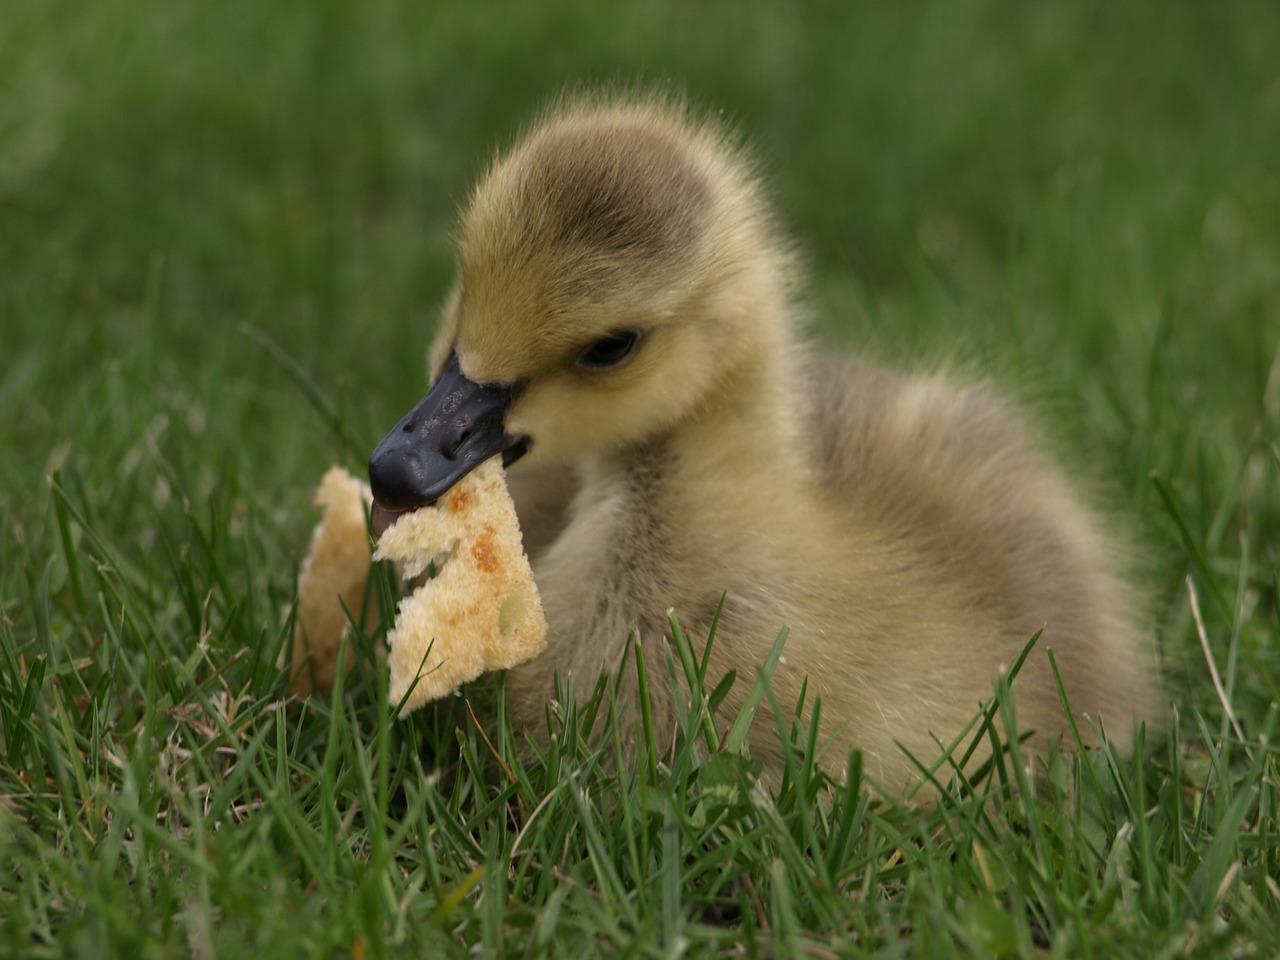 Feeding ducks stale white bread is a bad idea.